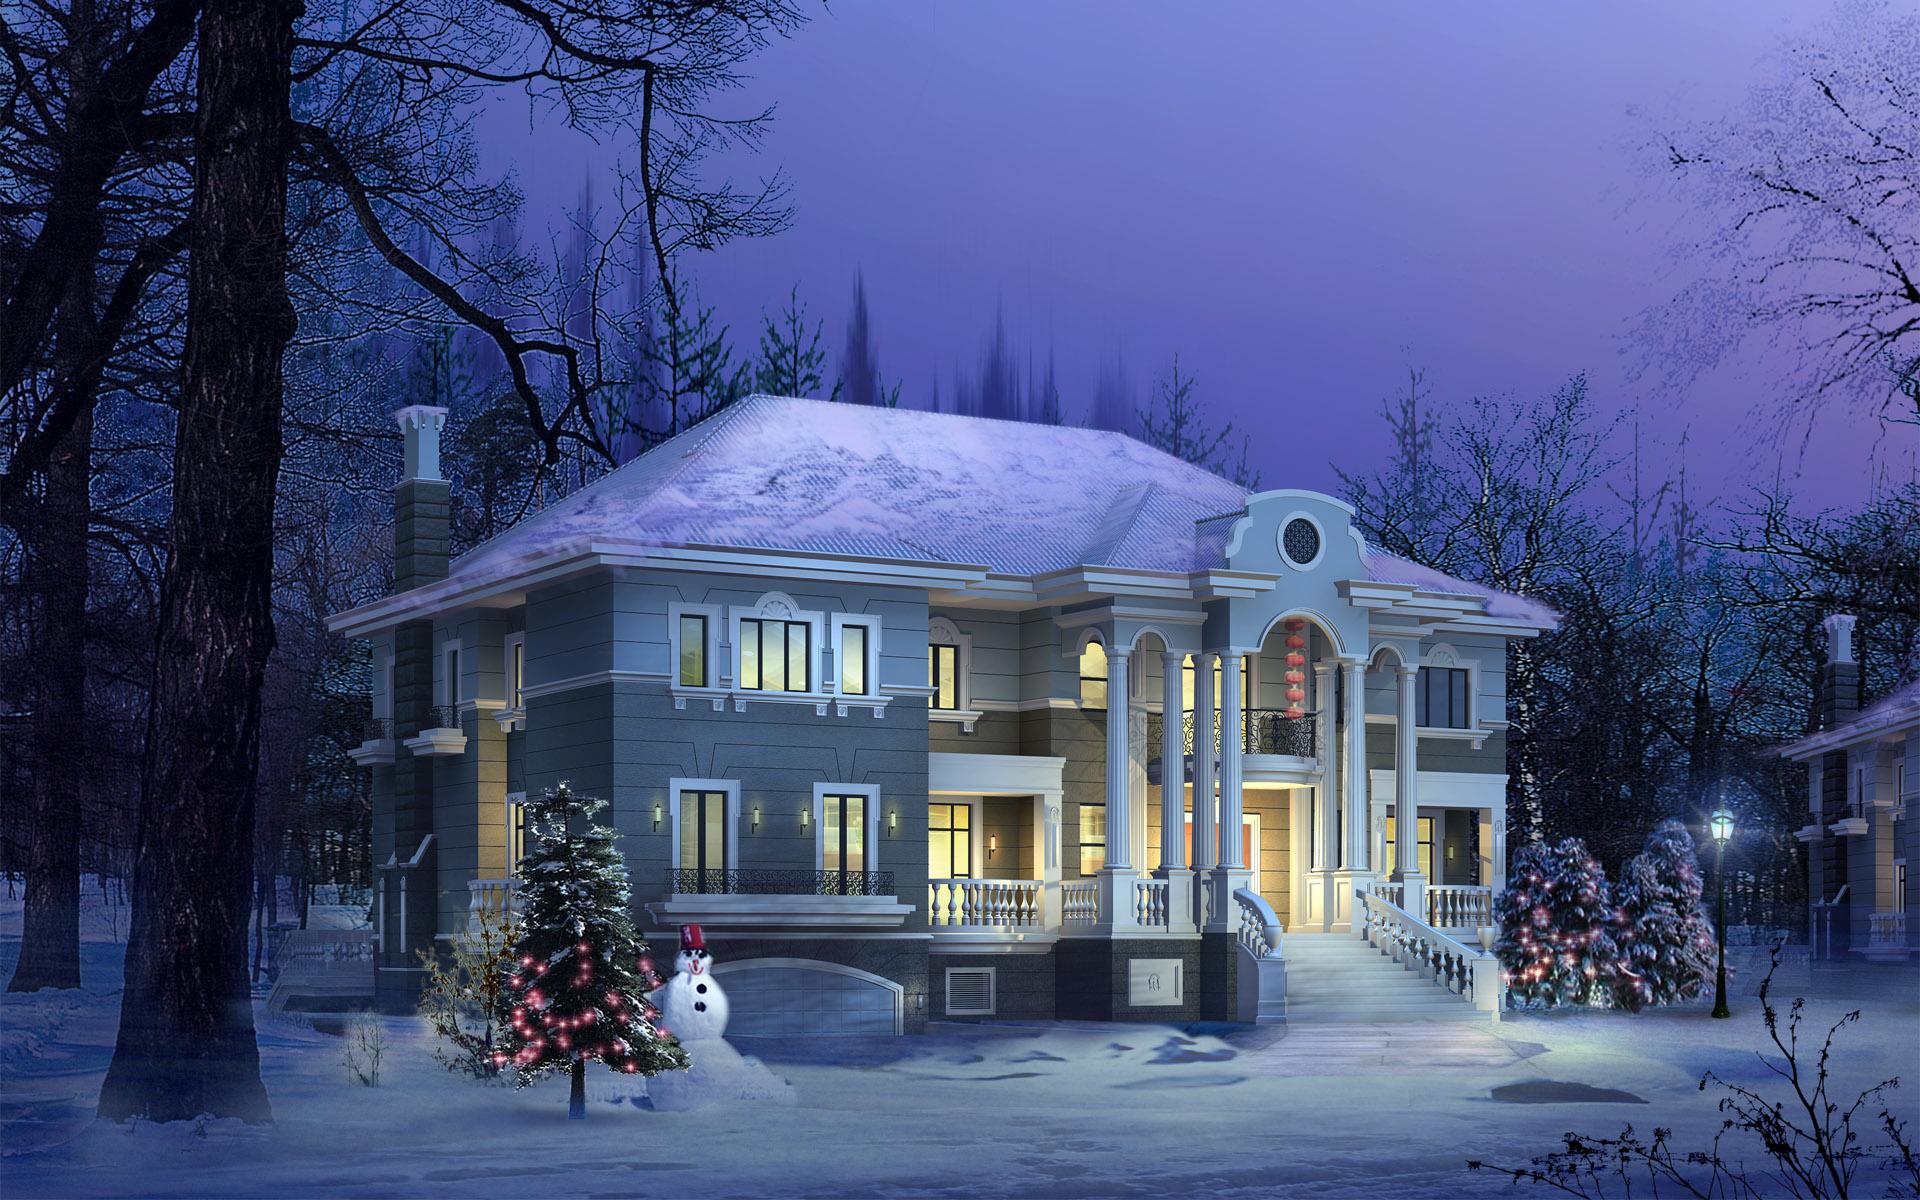 winter house wallpaper photo 1920x1200